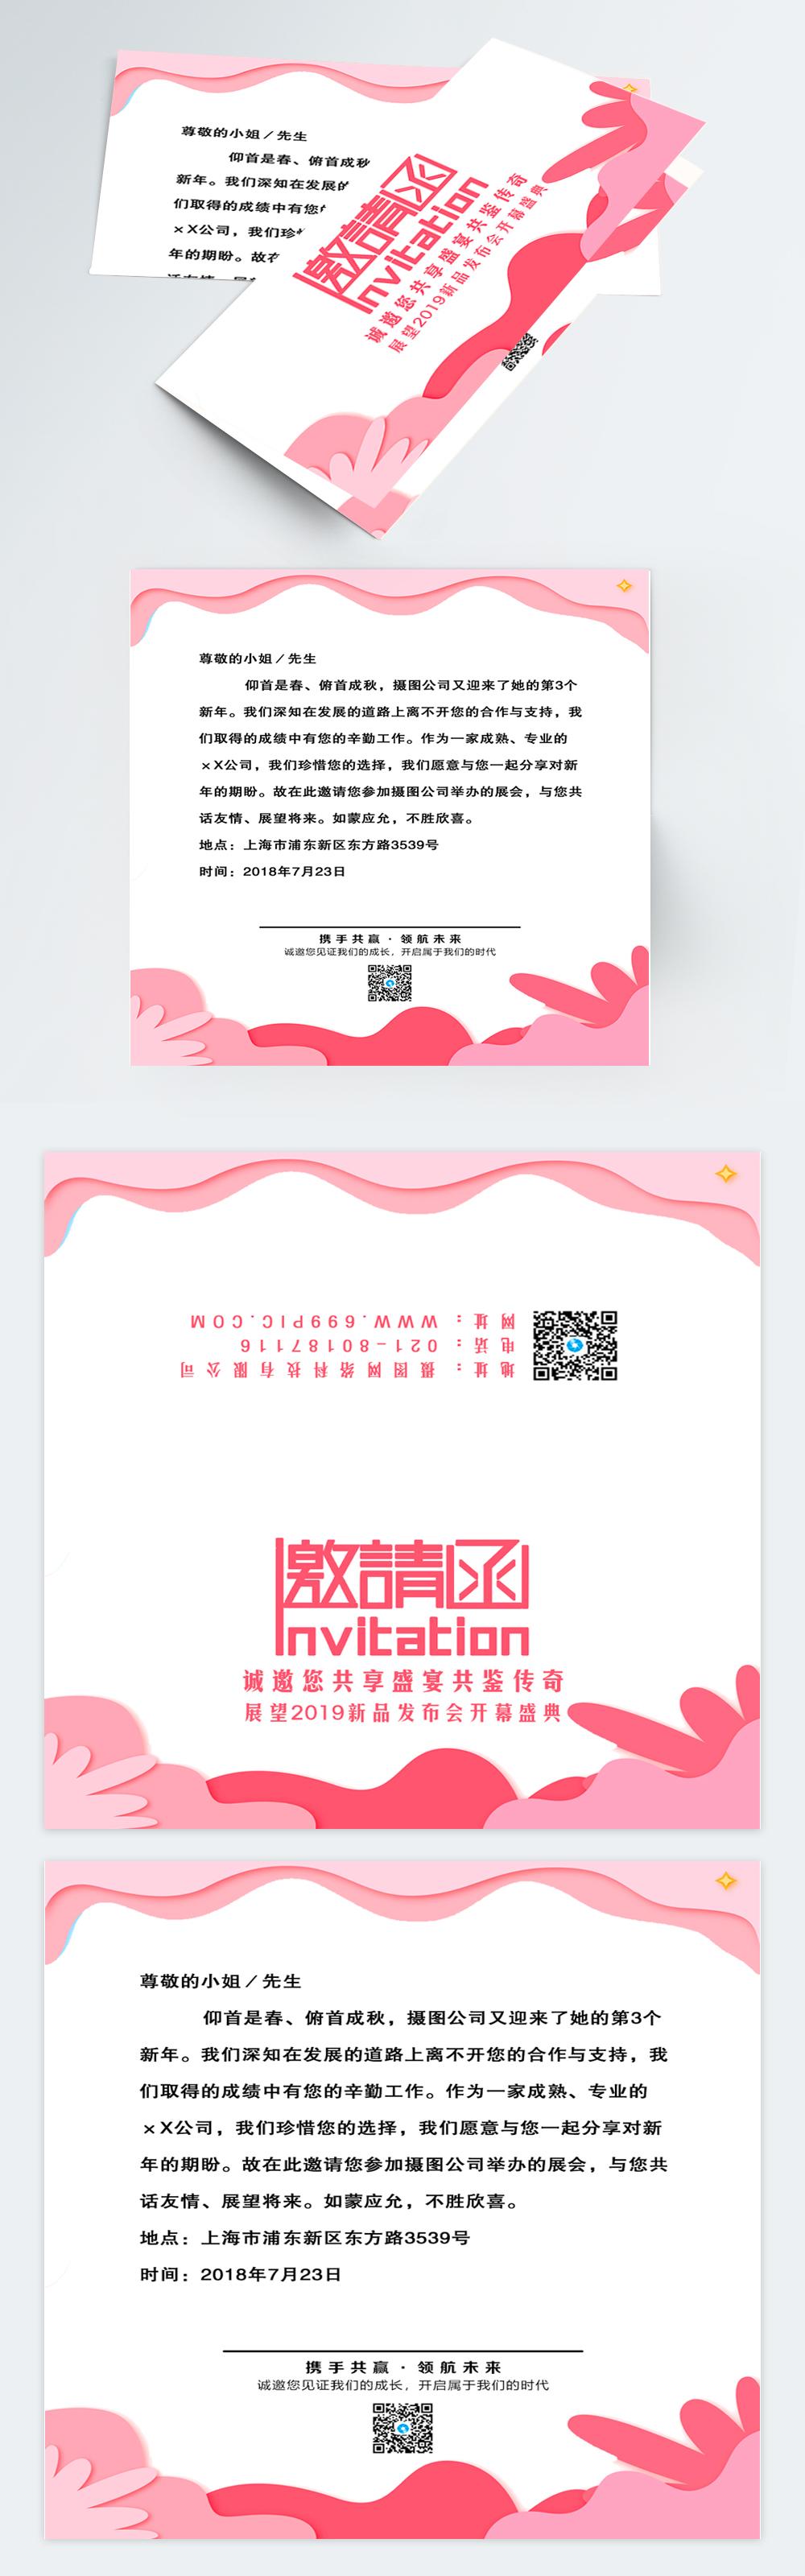 Invitation letter to the pink enterprise exhibition template invitation letter to the pink enterprise exhibition stopboris Gallery